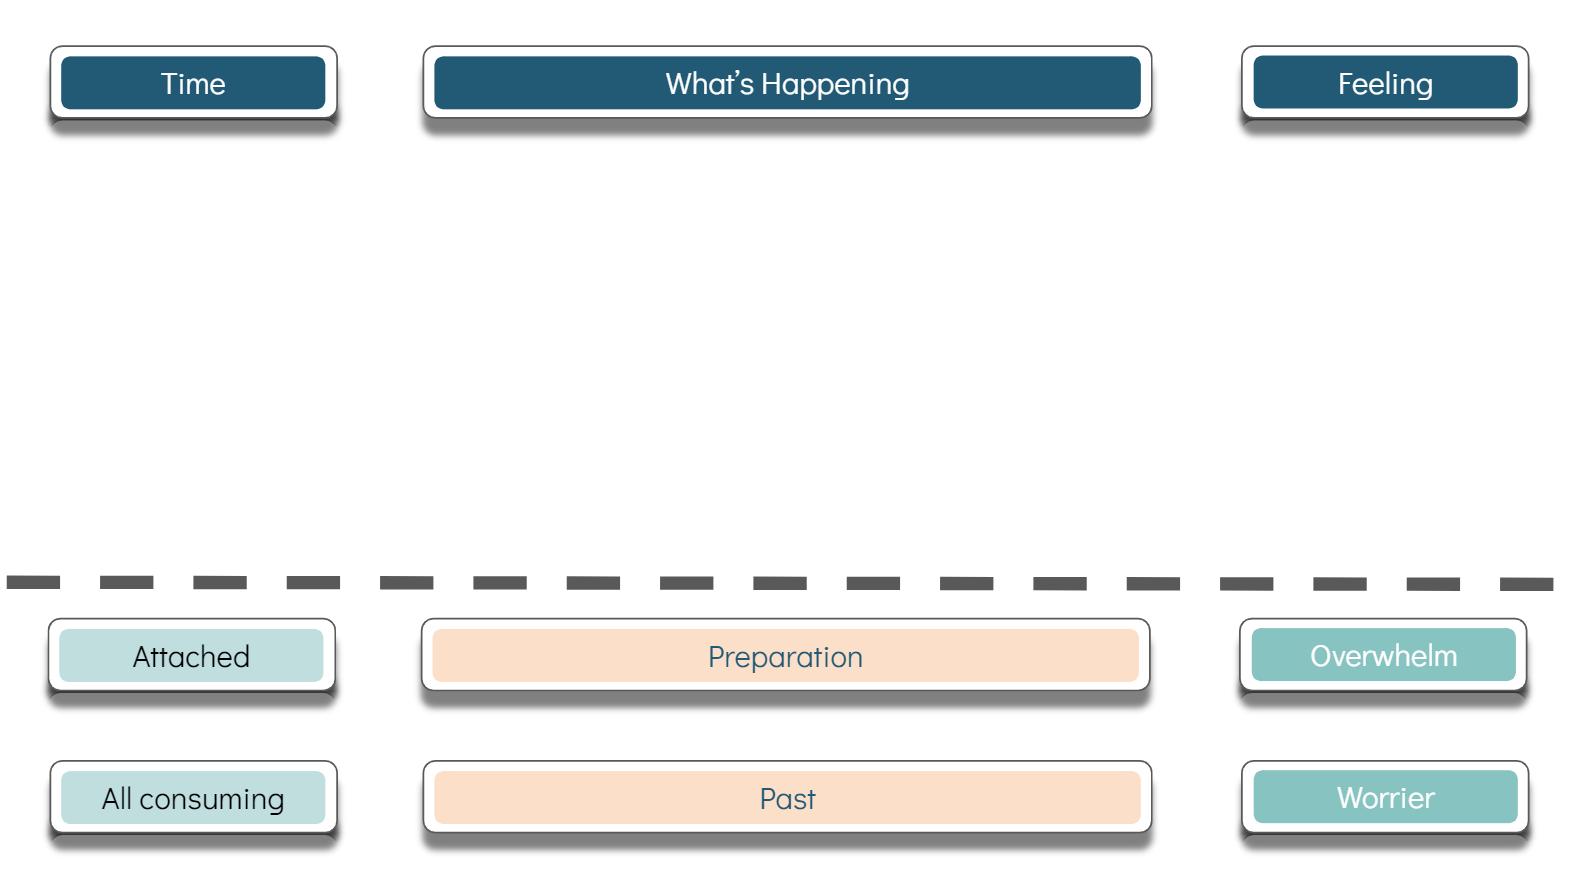 Step 2 - Overwhelm